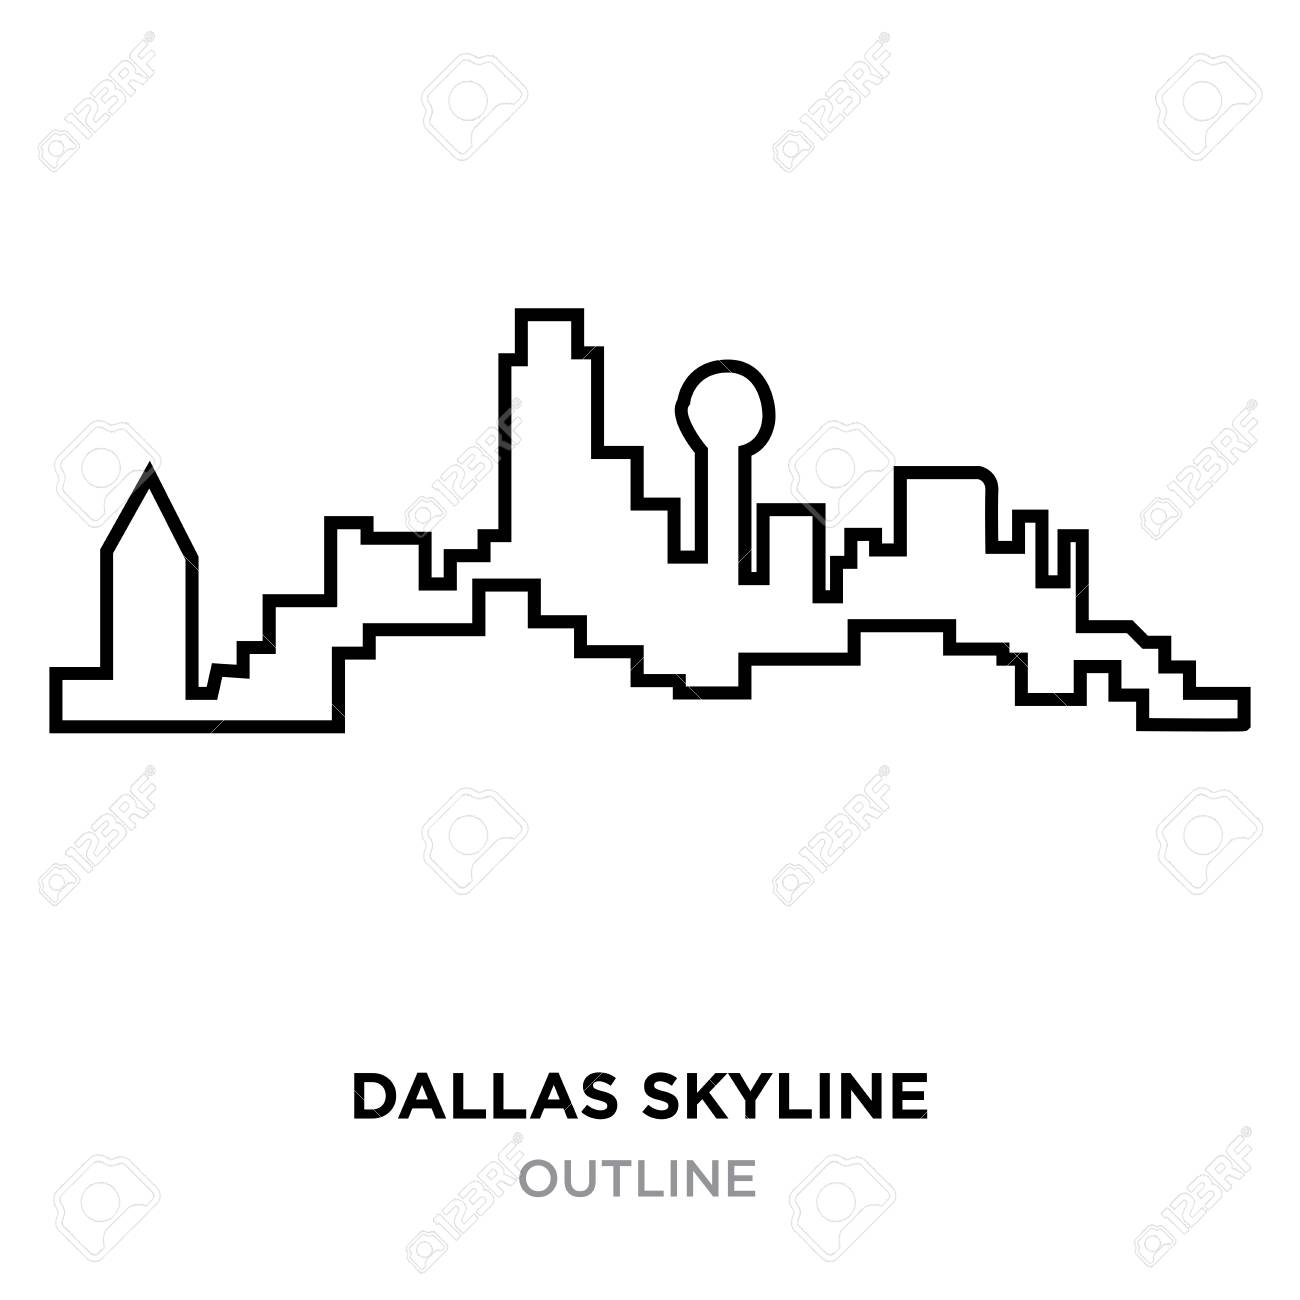 Dallas Skyline Outline On White Background Vector Illustration 1300x1300